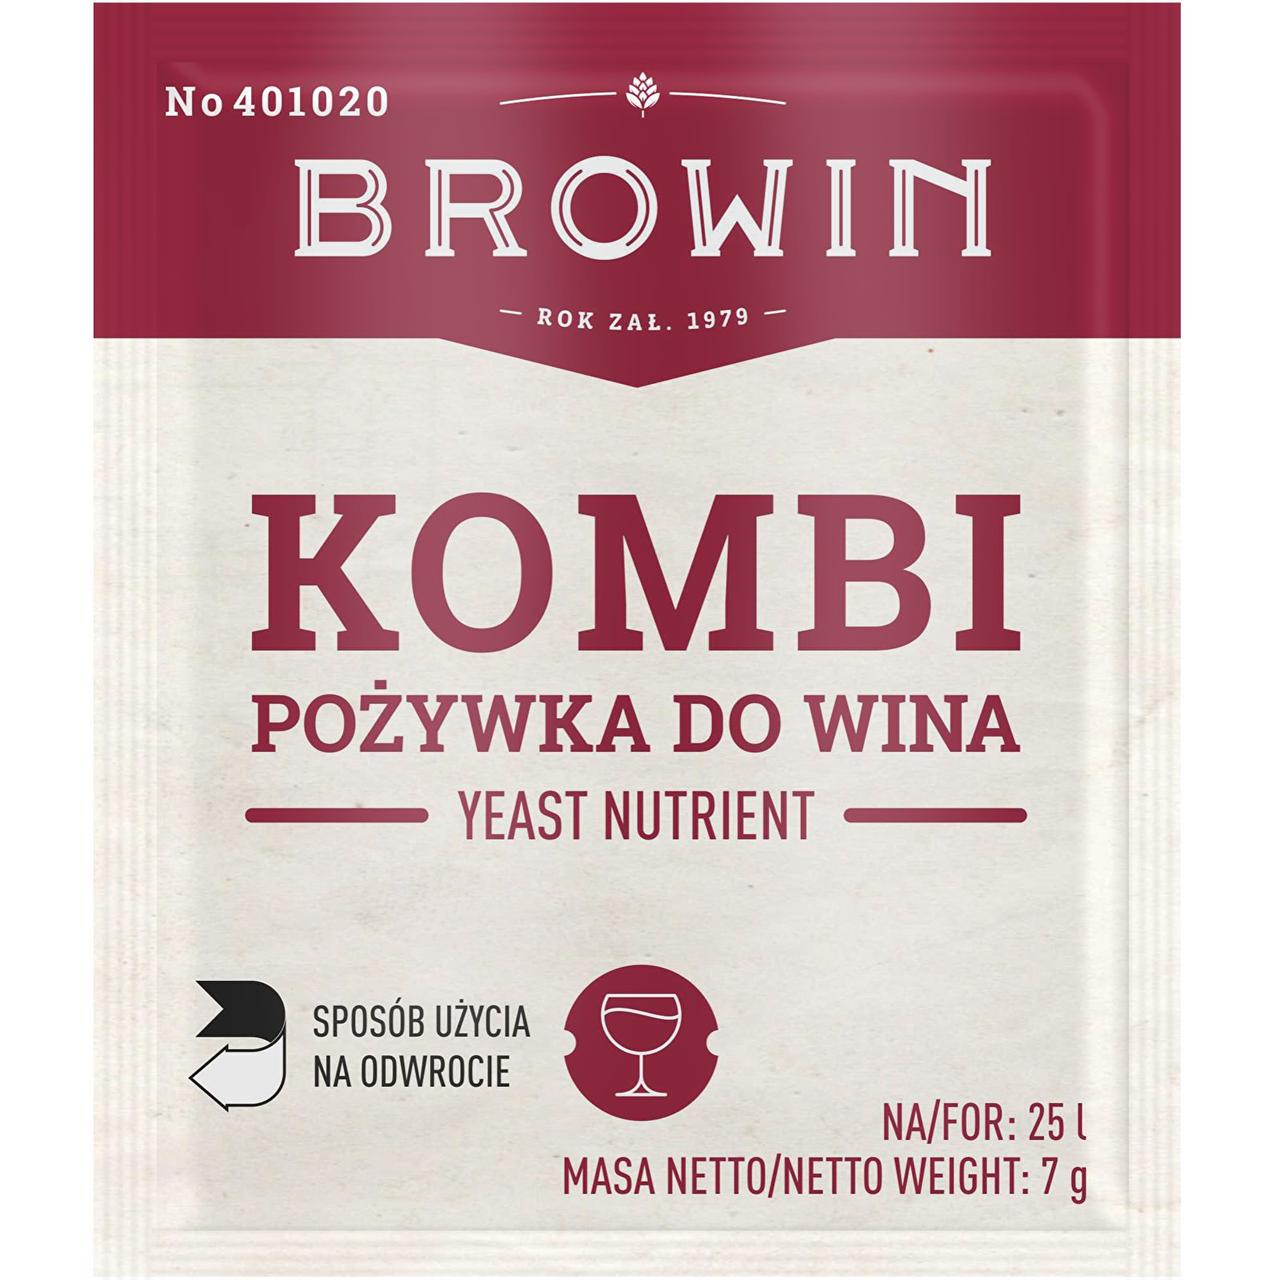 Комби питательная среда для виноделия с витамином B1, BROWIN Польша Термін придатності до 01.2021